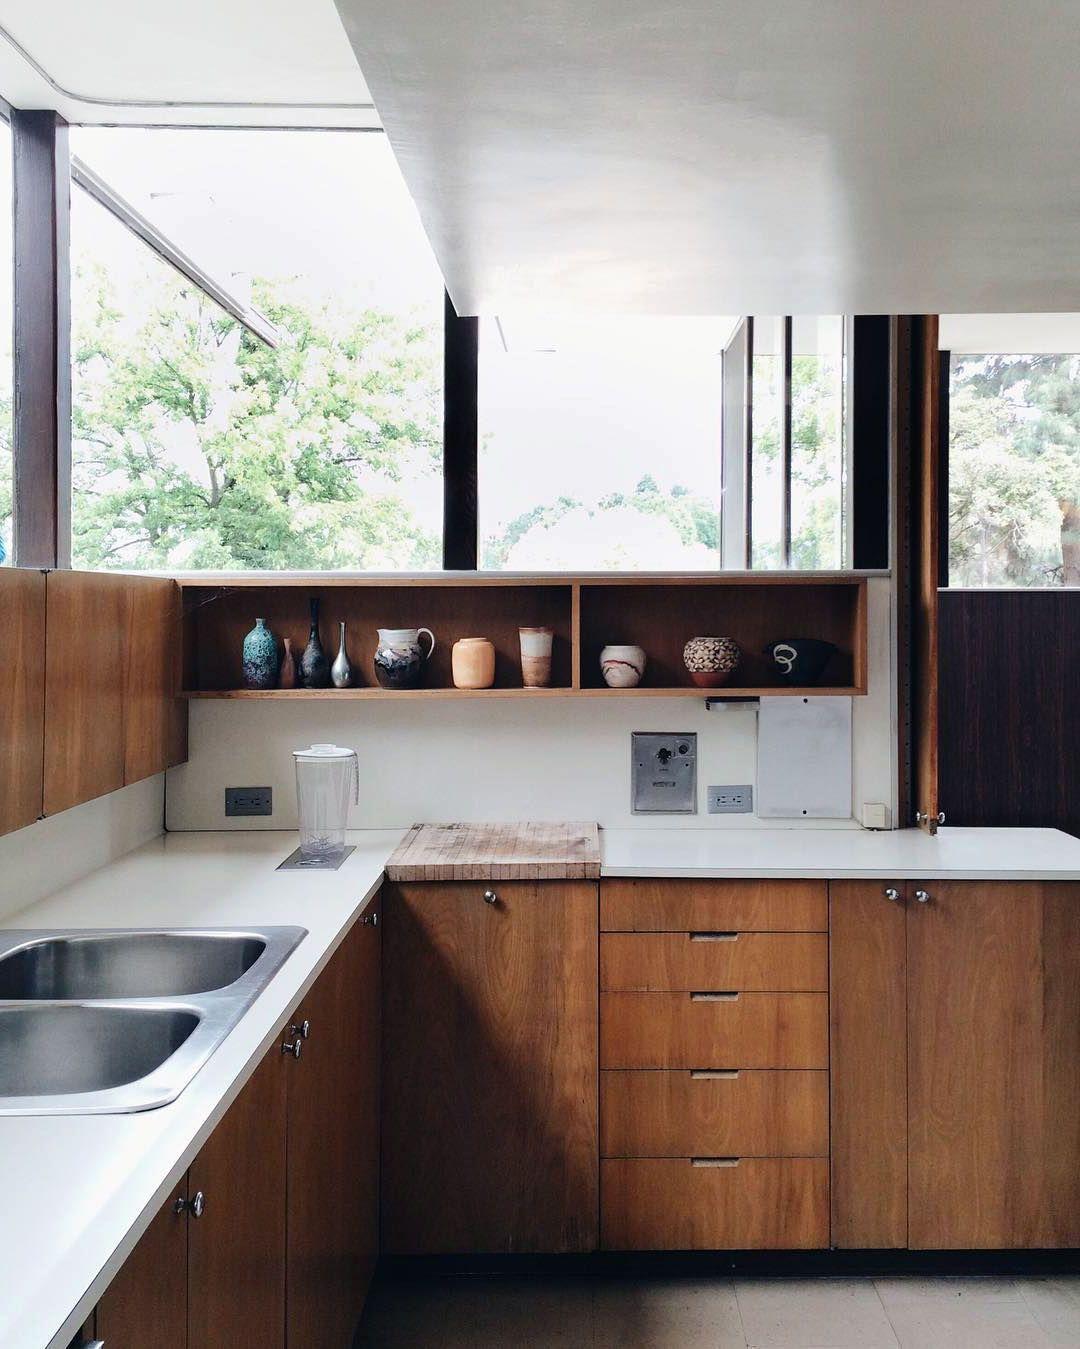 24 Beautiful Scandinavian Kitchen Mix With Mid Century Style Ideas In 2020 Mid Century Modern Kitchen Kitchen Design Rustic Kitchen